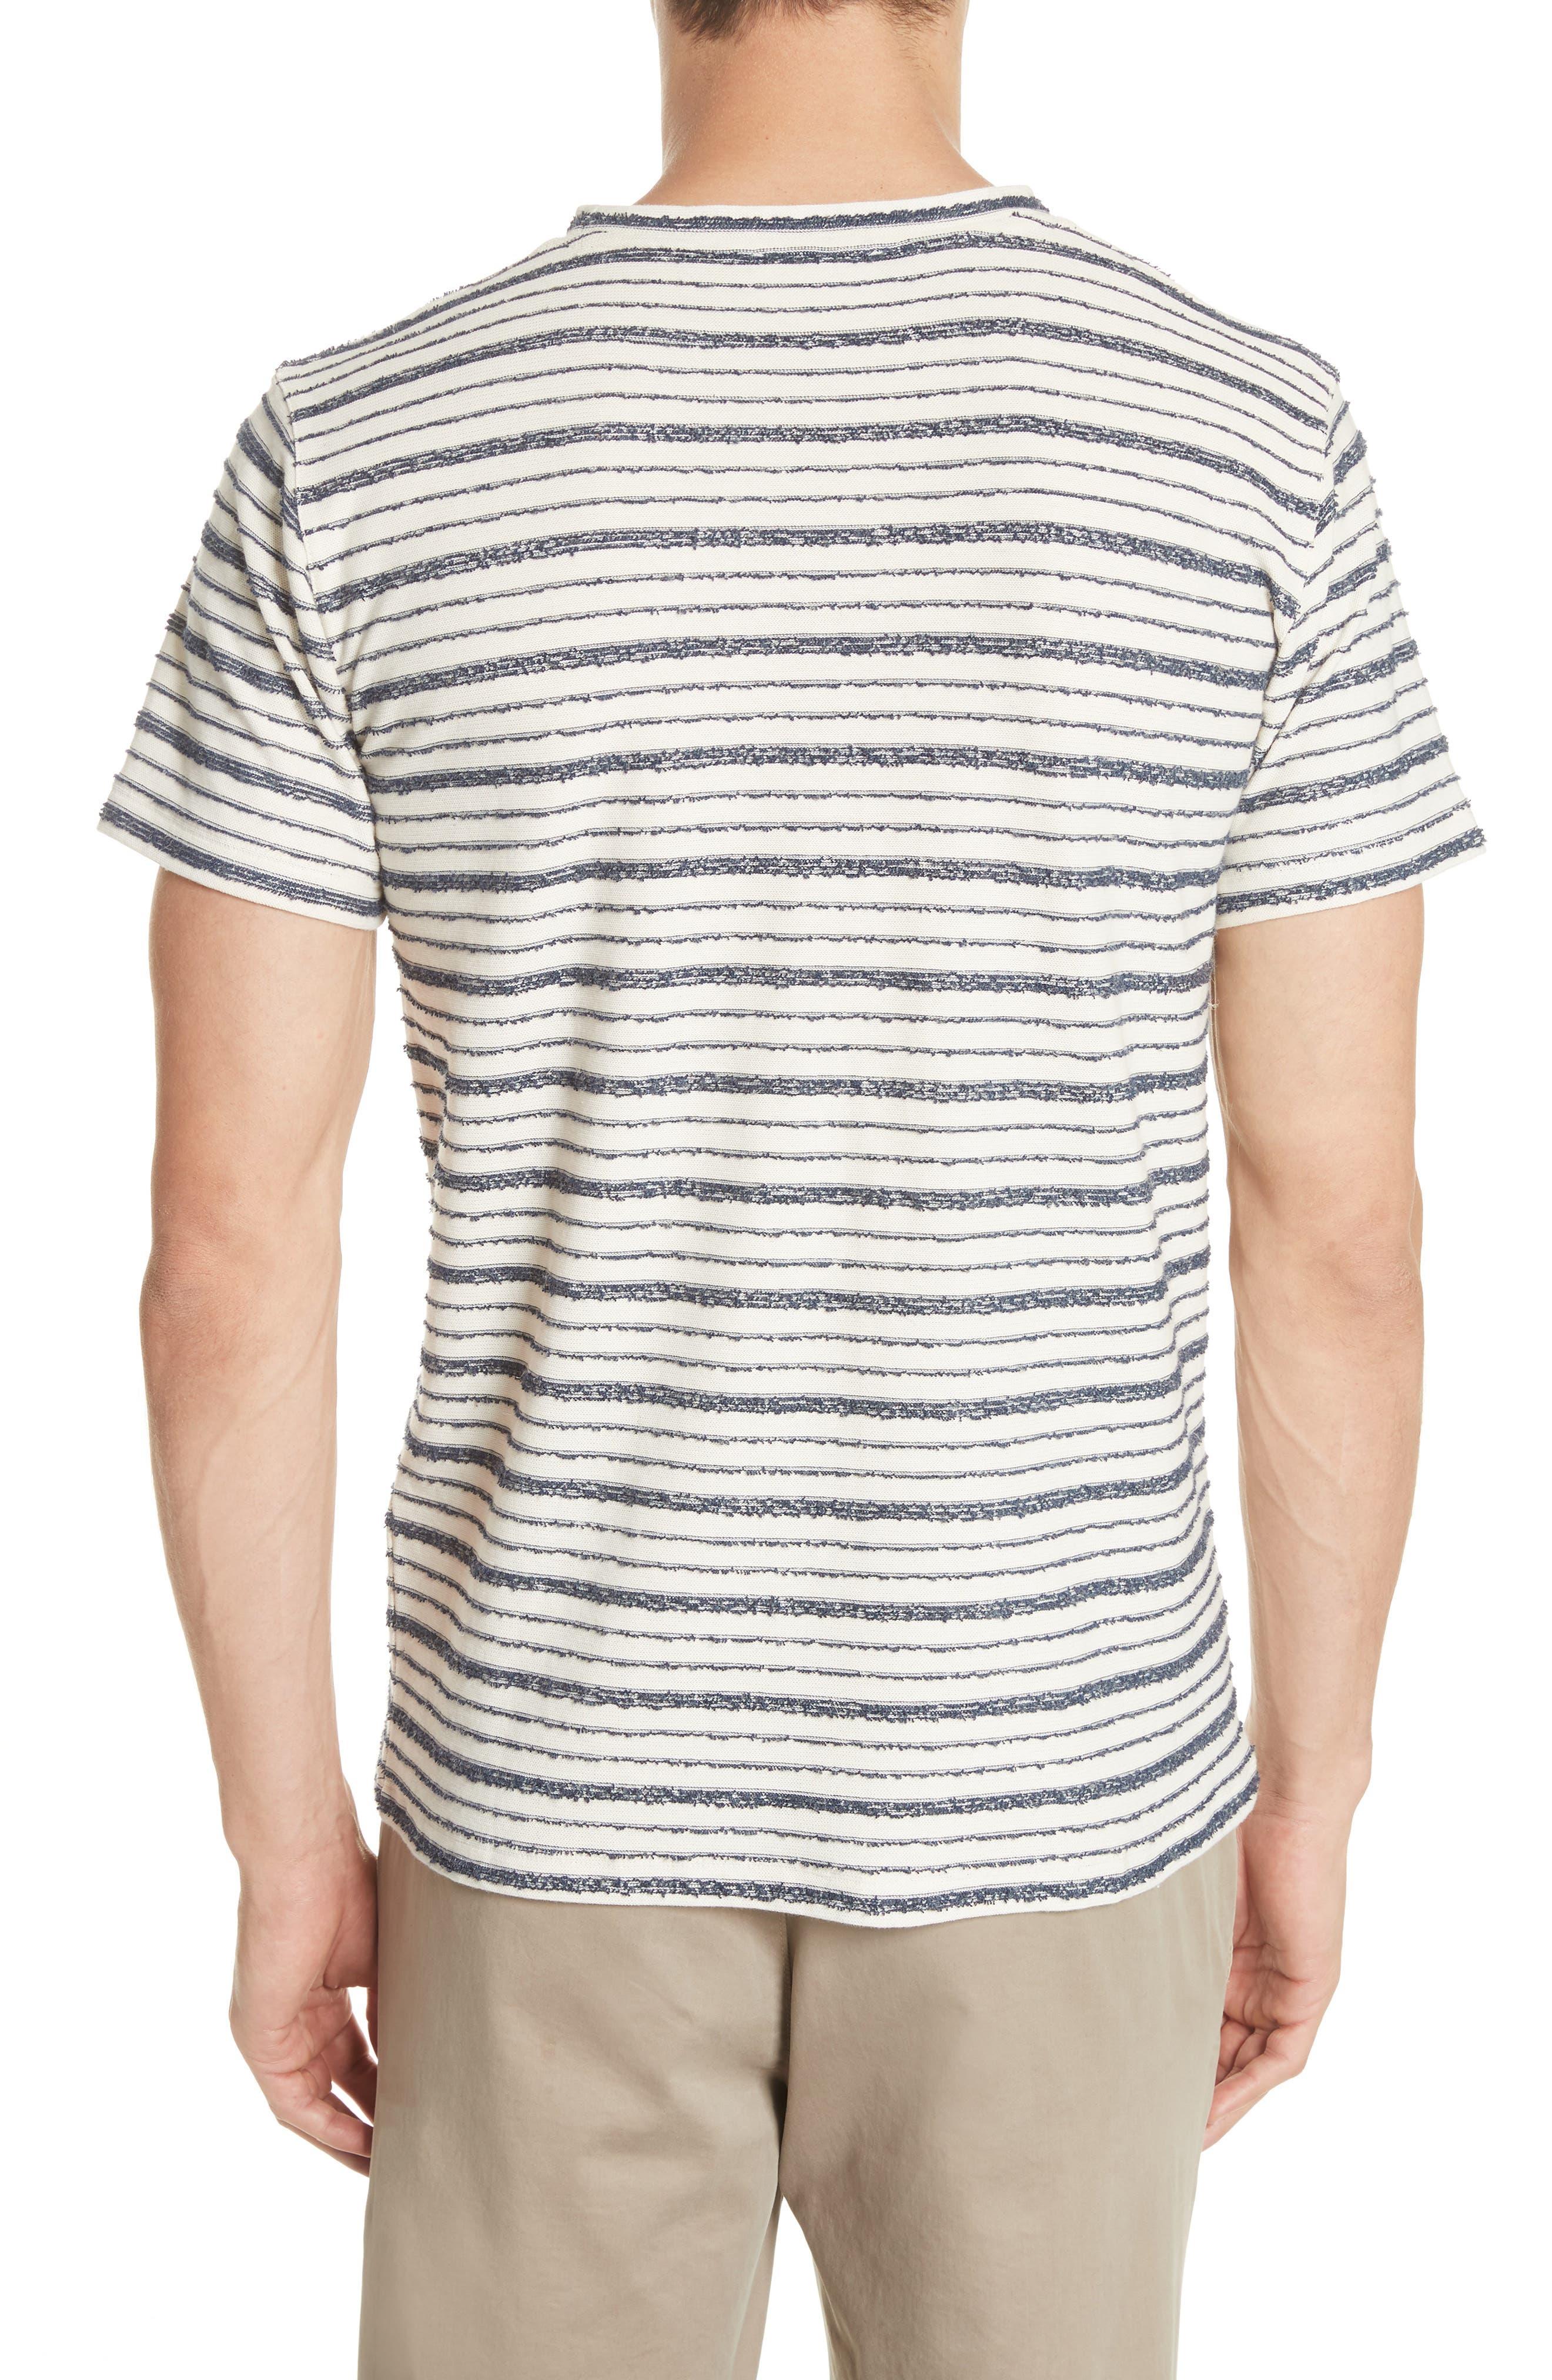 Niels Textured Stripe T-Shirt,                             Alternate thumbnail 2, color,                             DARK NAVY